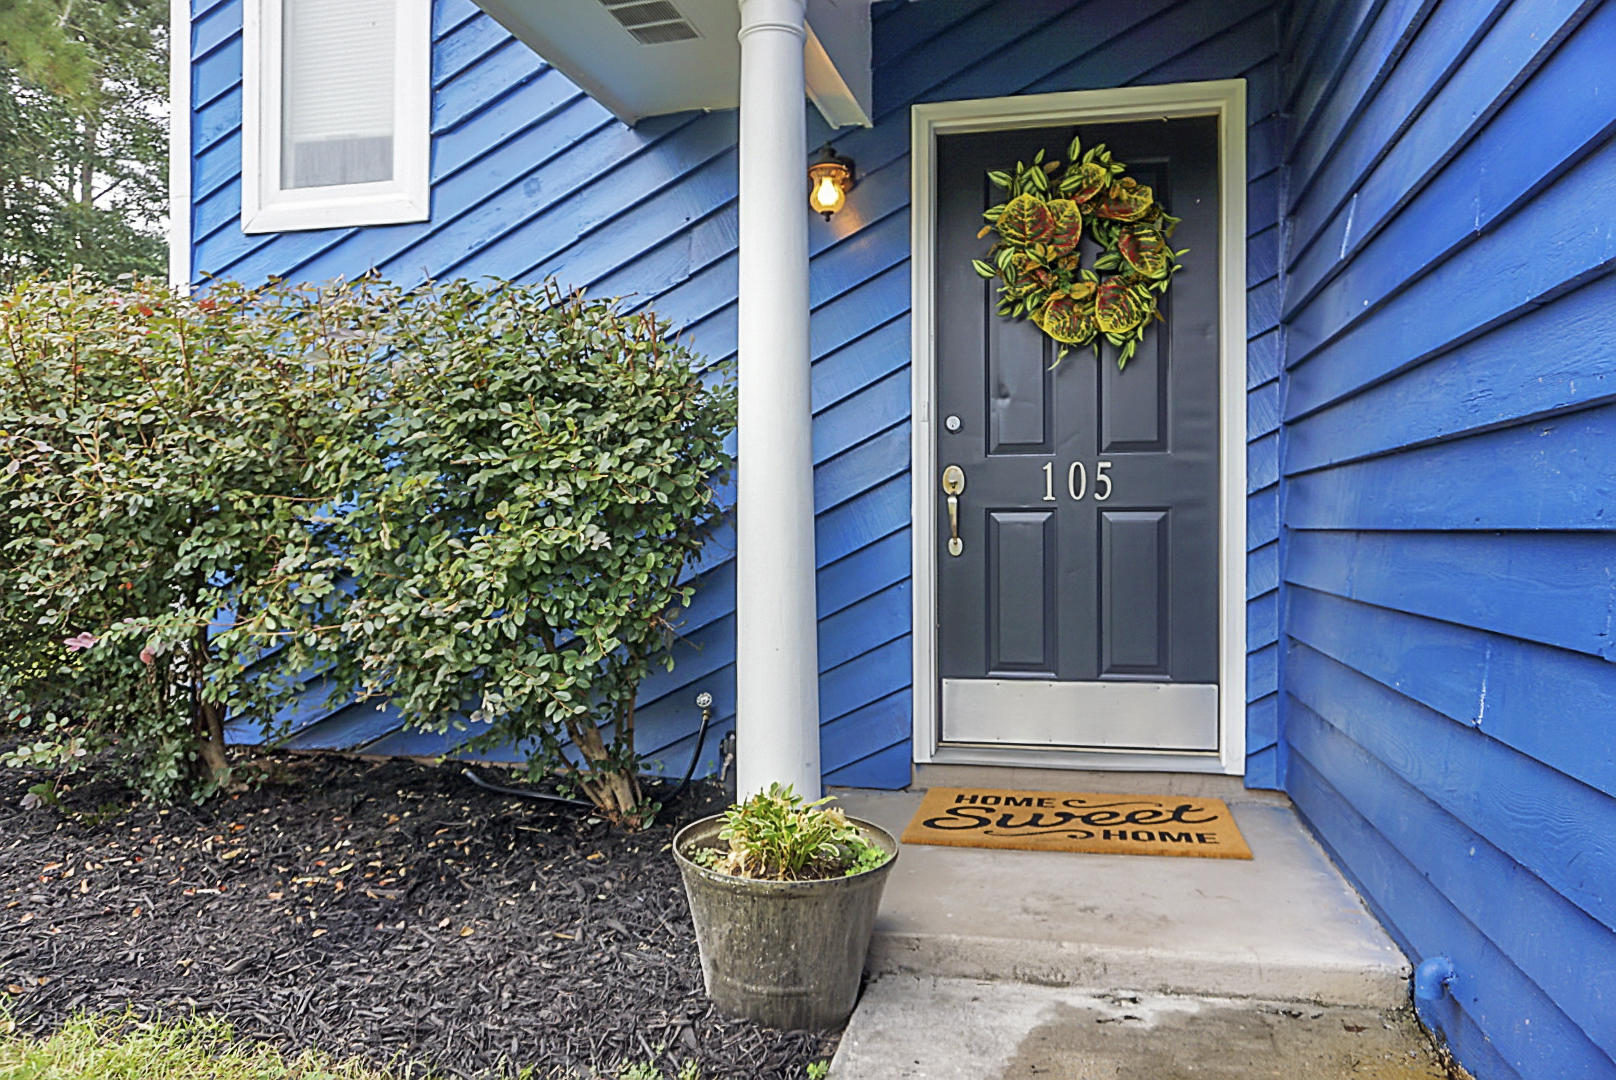 Sangaree Homes For Sale - 105 Santee, Summerville, SC - 24